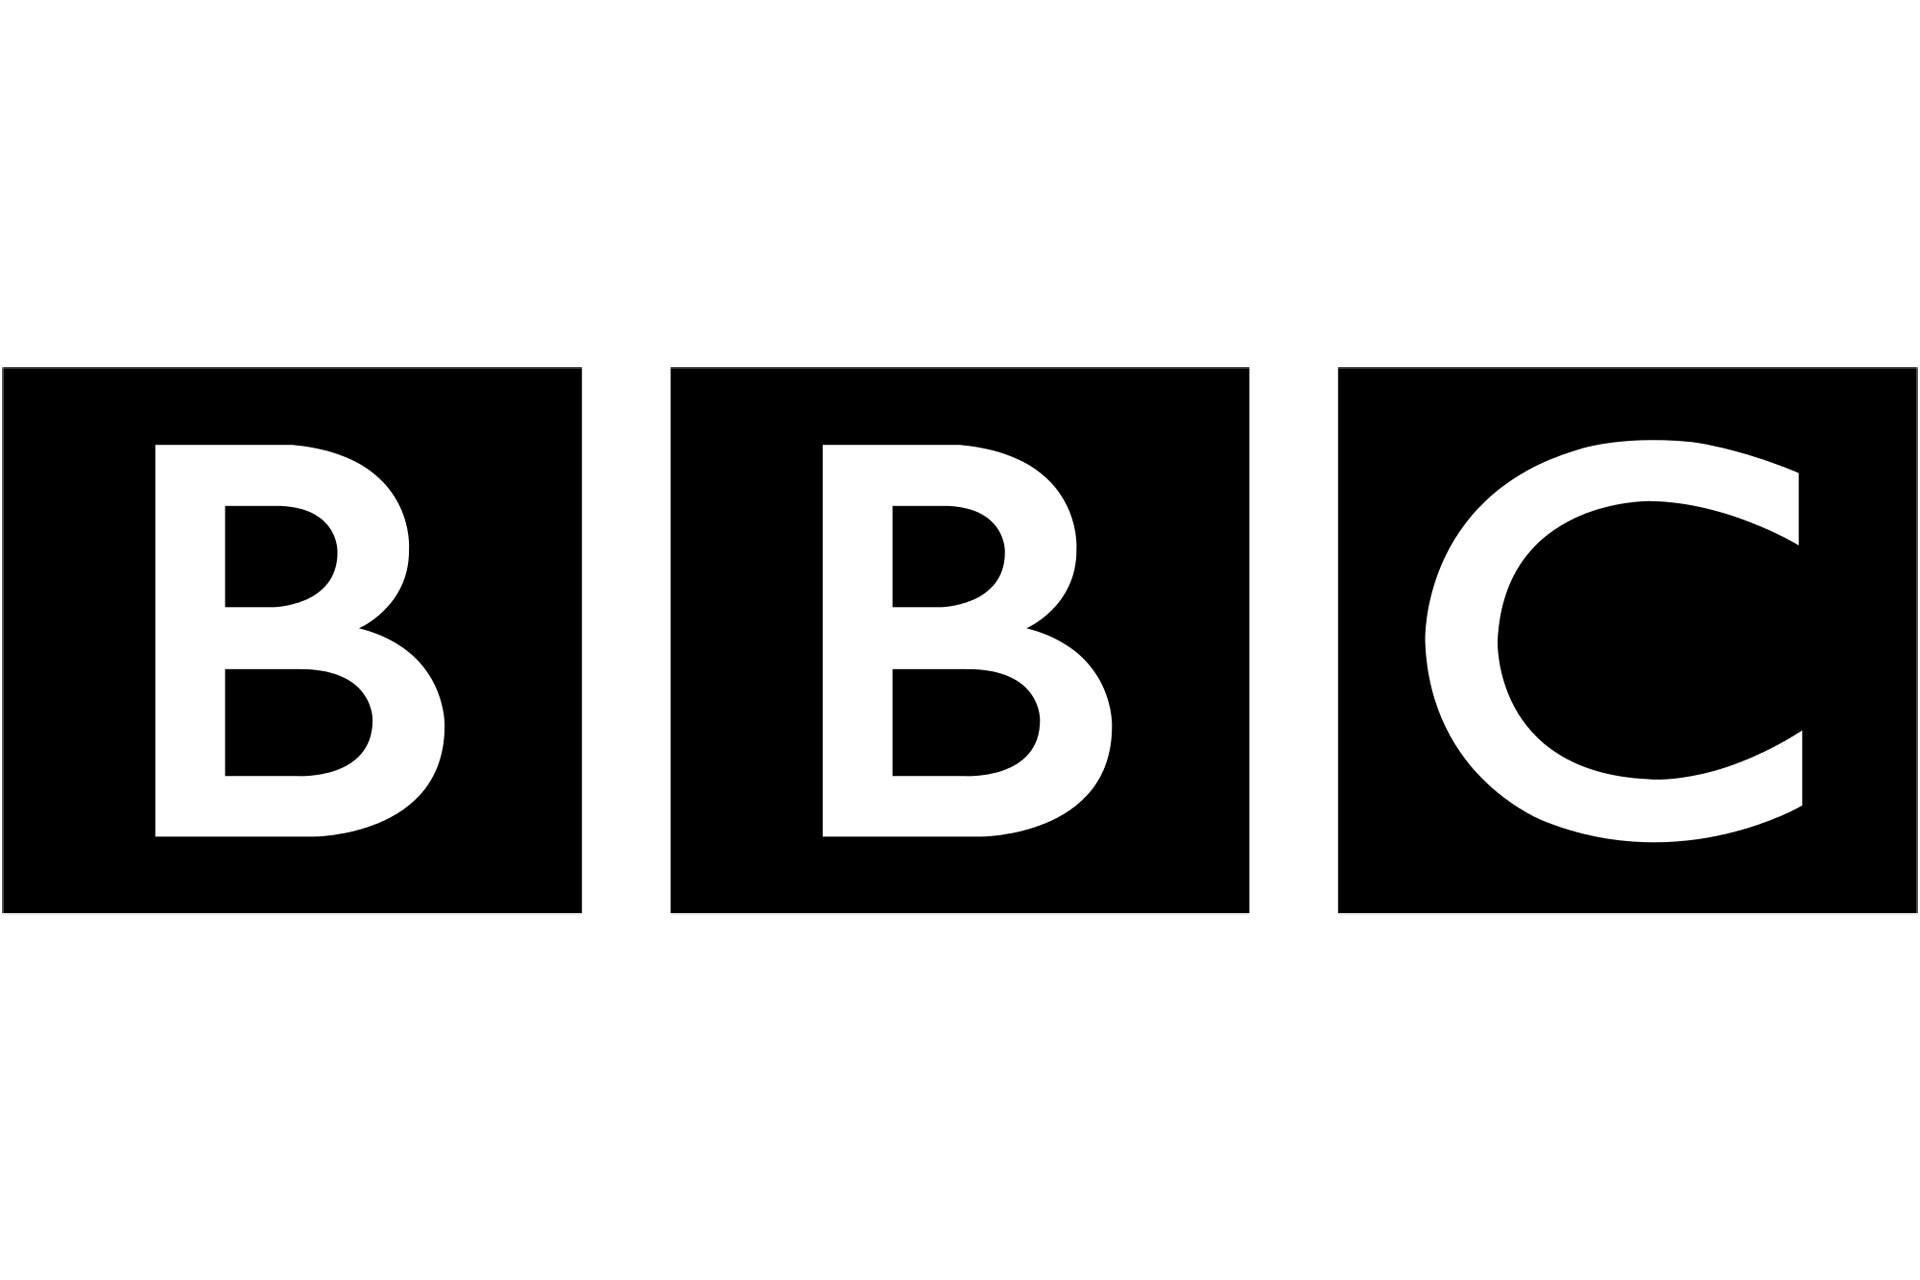 BBC_3.jpg